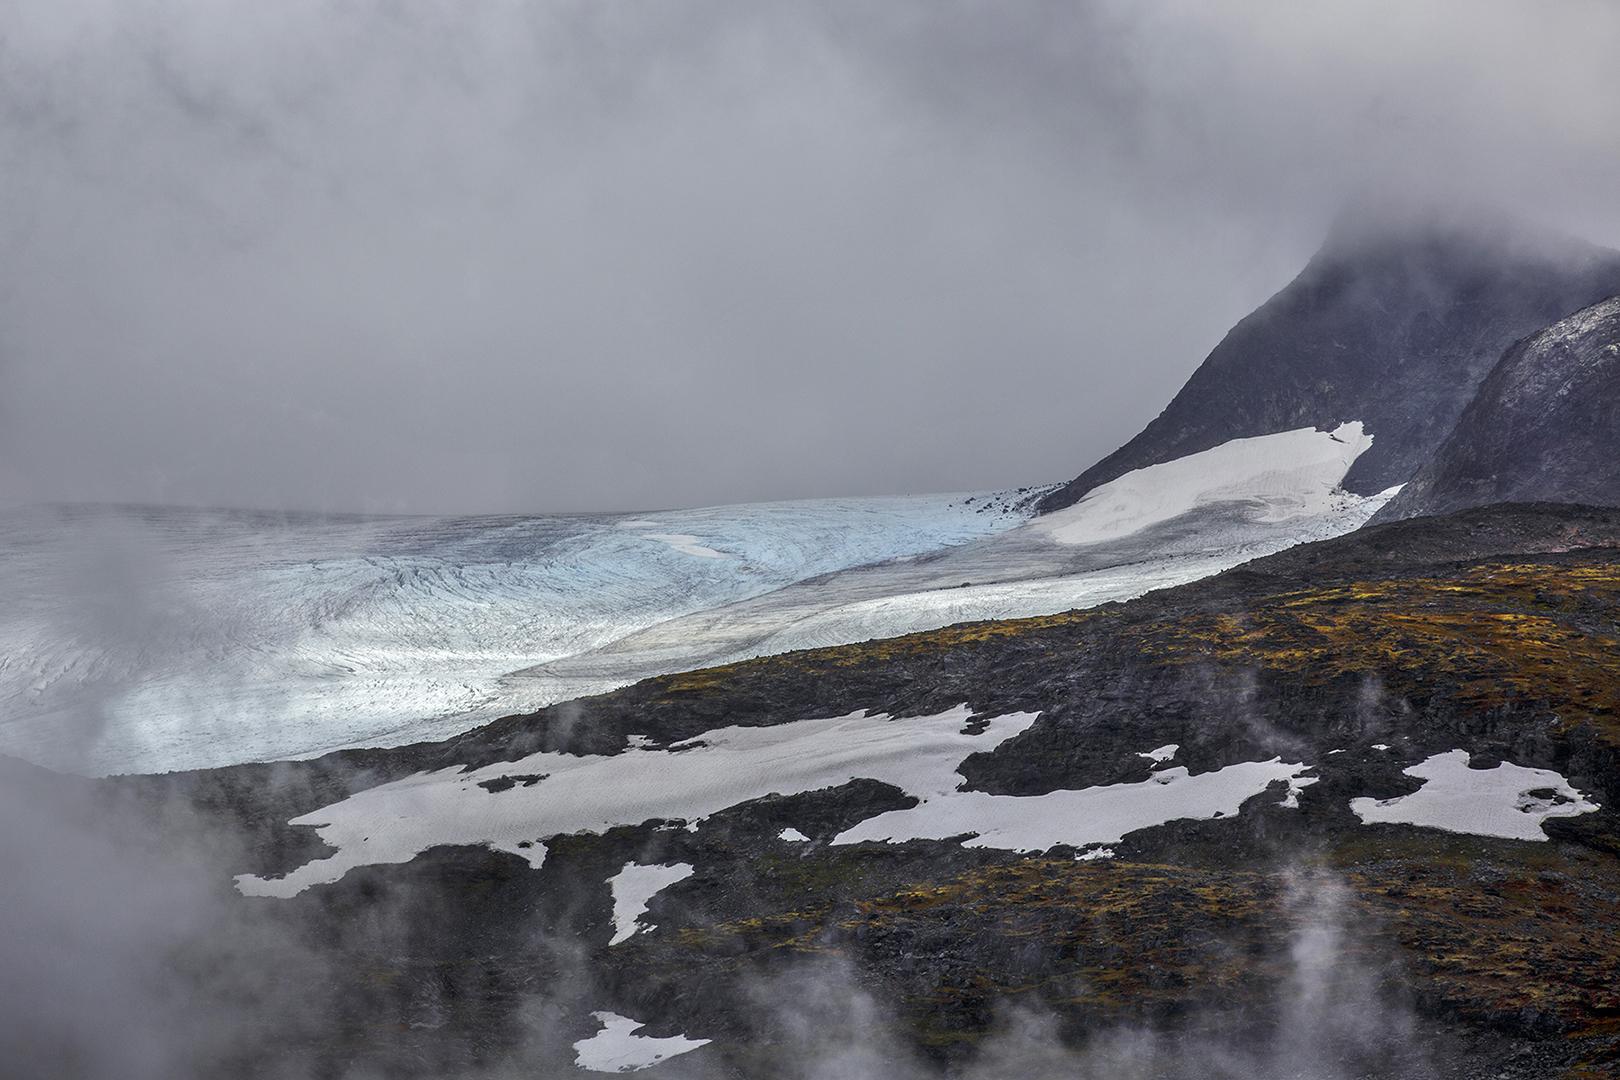 1810 Op de hoogvlakte route 55 2014-09-08 Bw-nv 1620